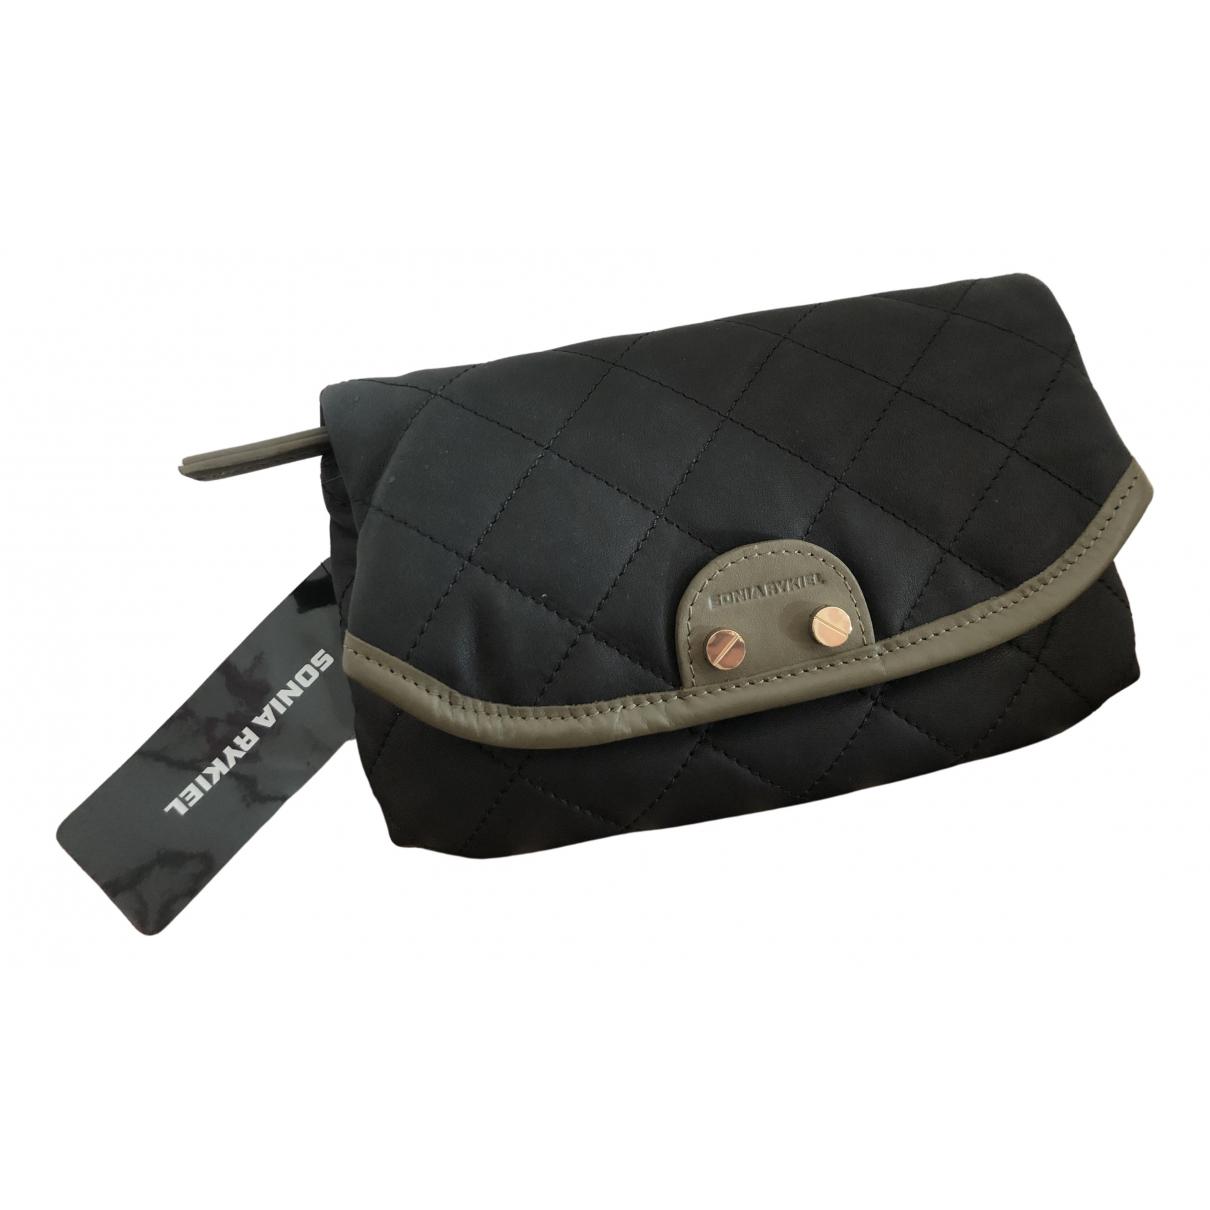 Sonia Rykiel N Black Leather Purses, wallet & cases for Women N